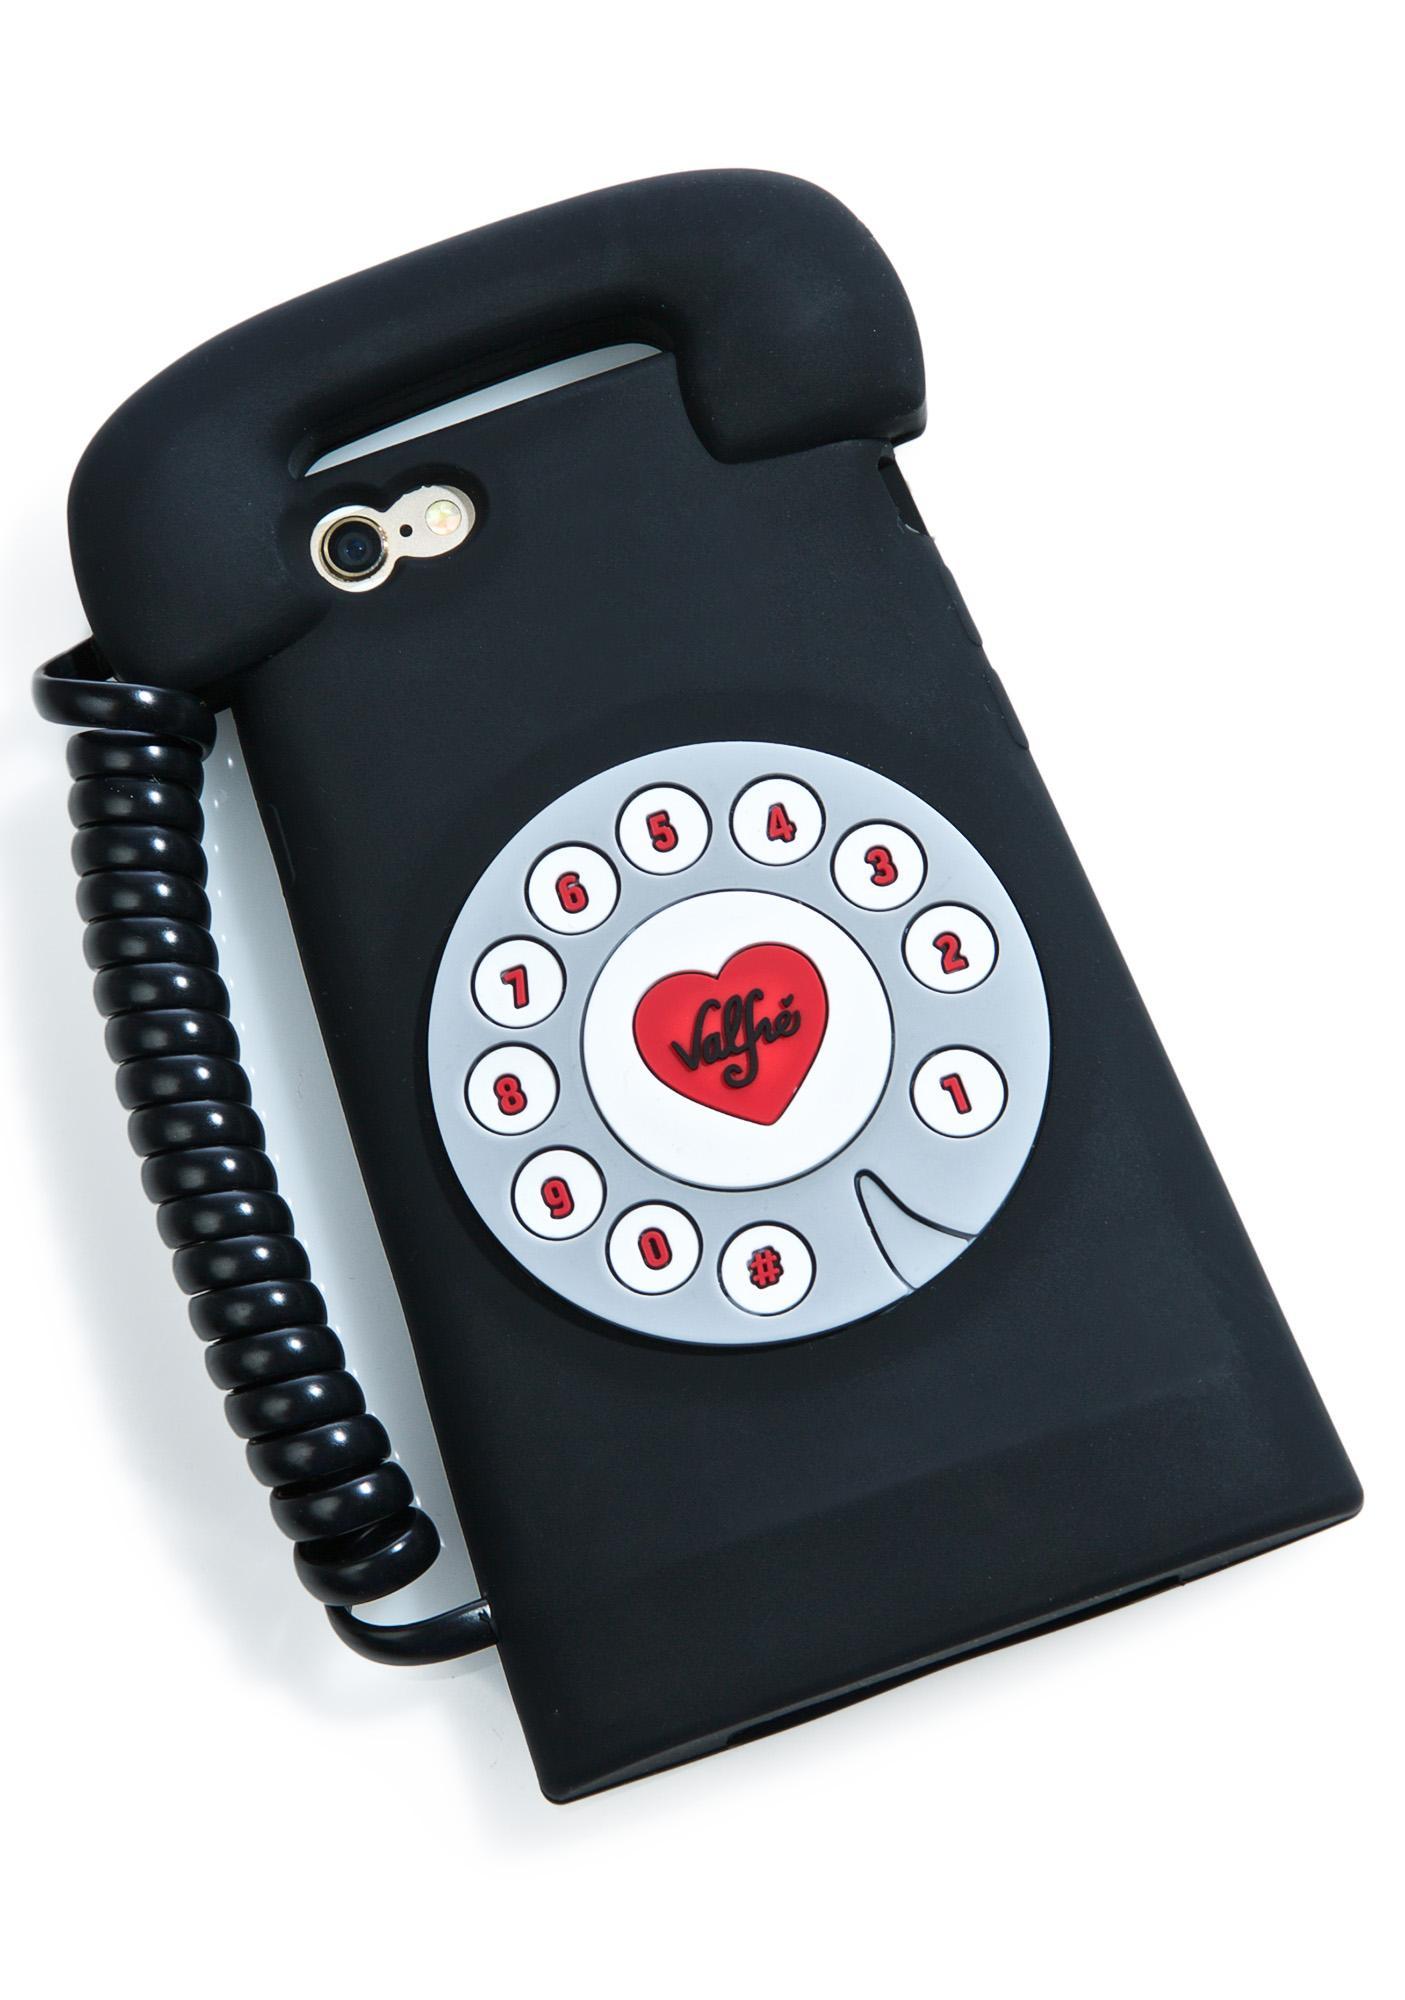 Valfré Tele 3D iPhone 6/6+ Case